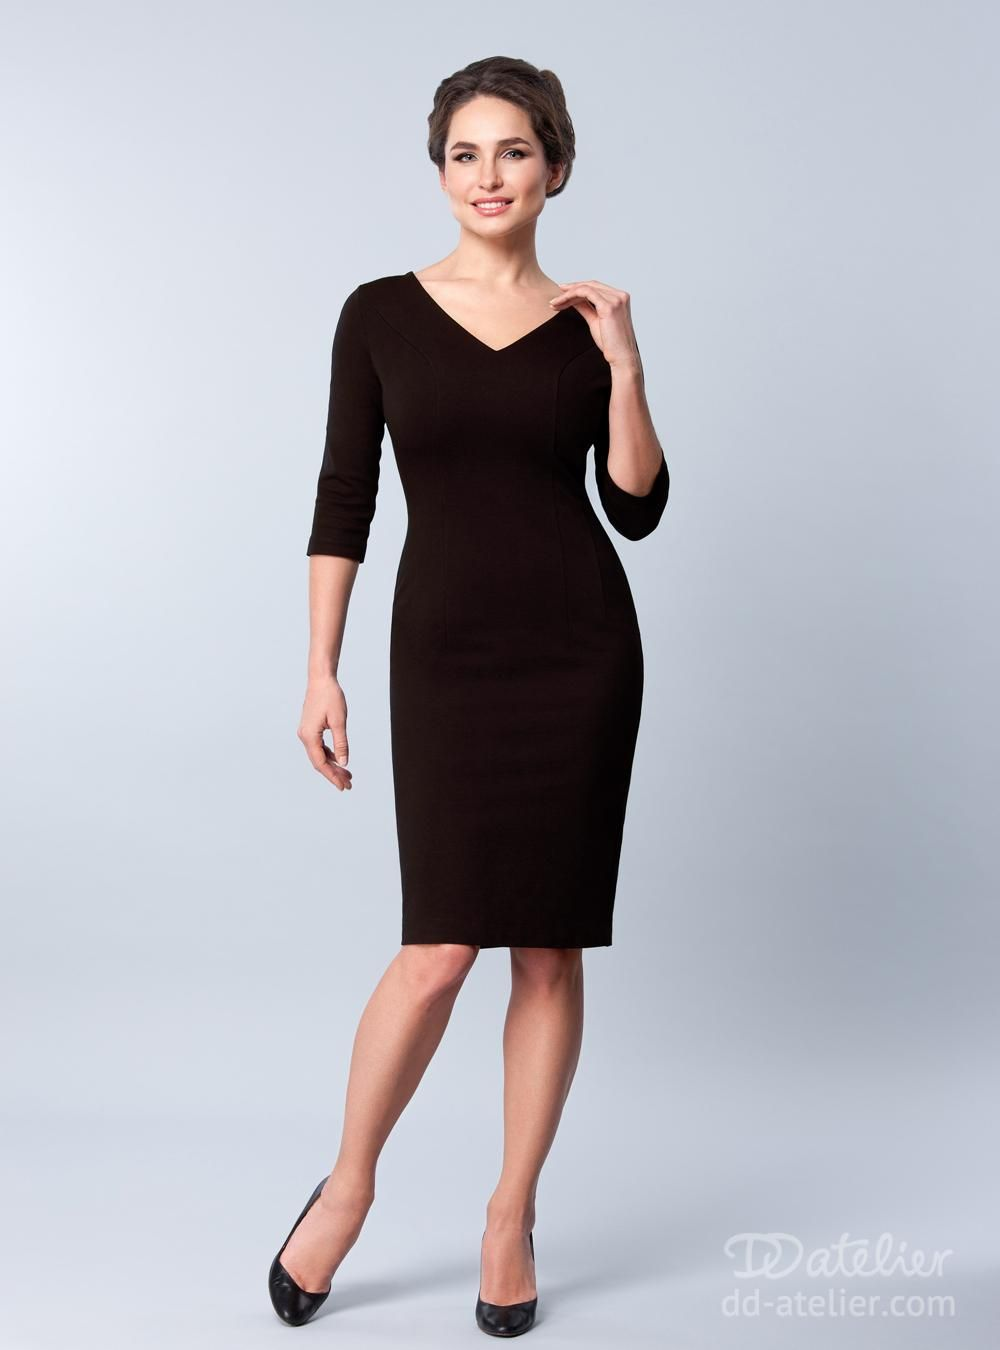 Dress Sienna in Brown, for a big bust #DDatelierChristmas